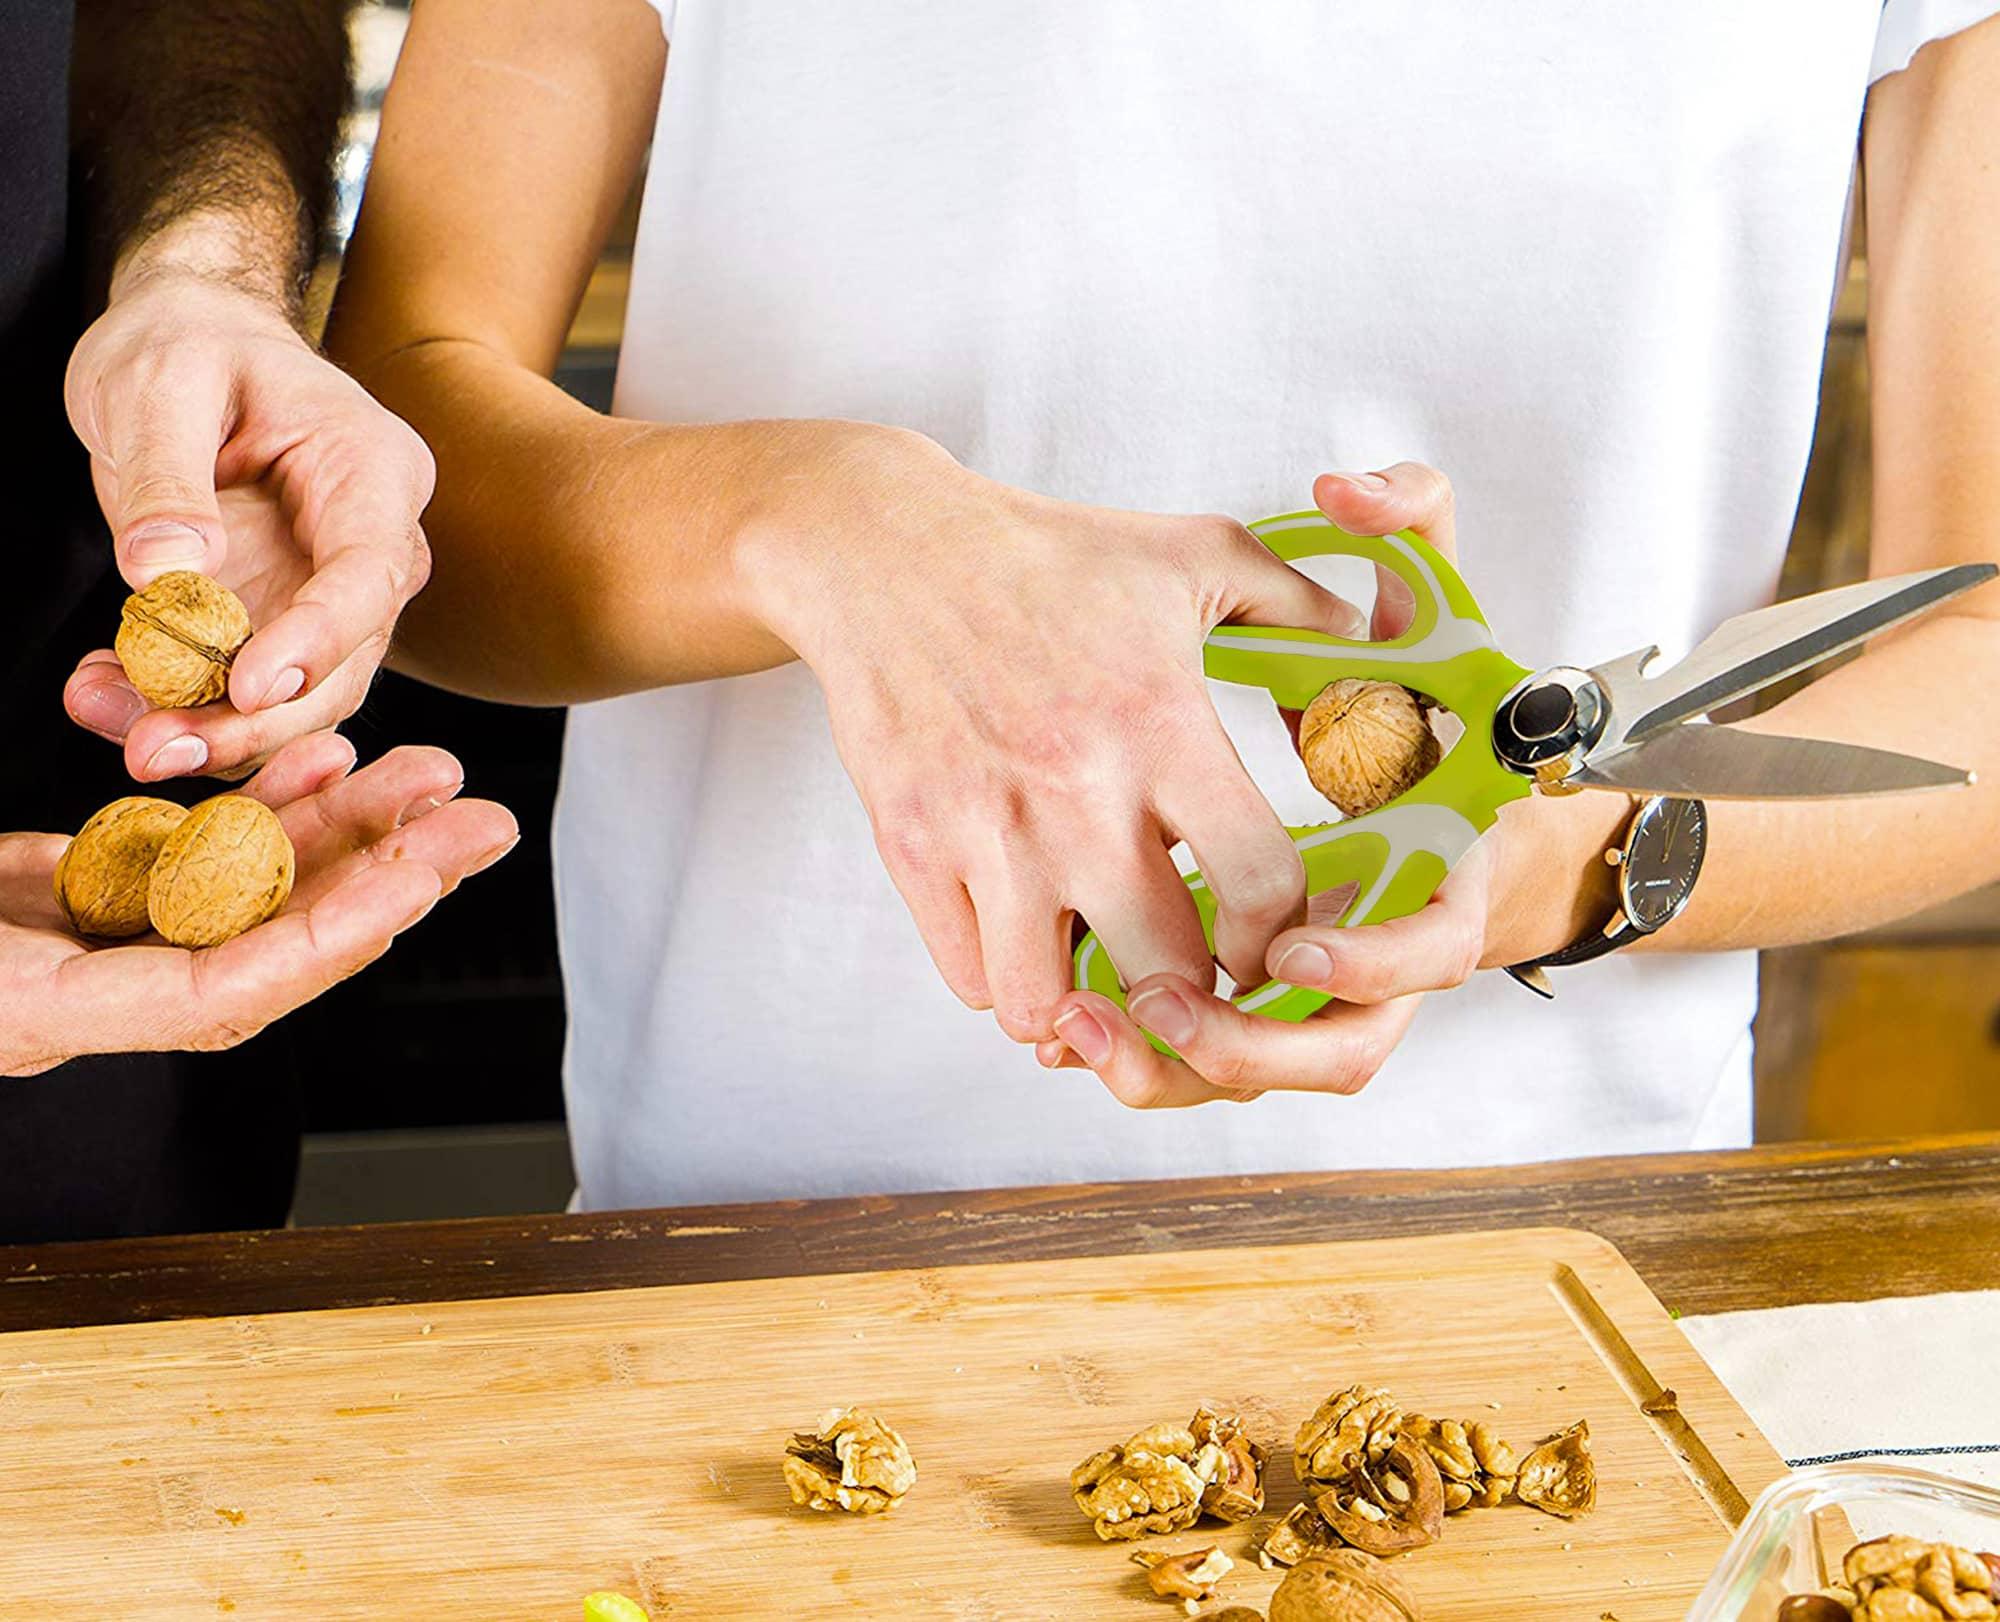 Using Benchusch Multipurpose Kitchen Shears cracking walnuts